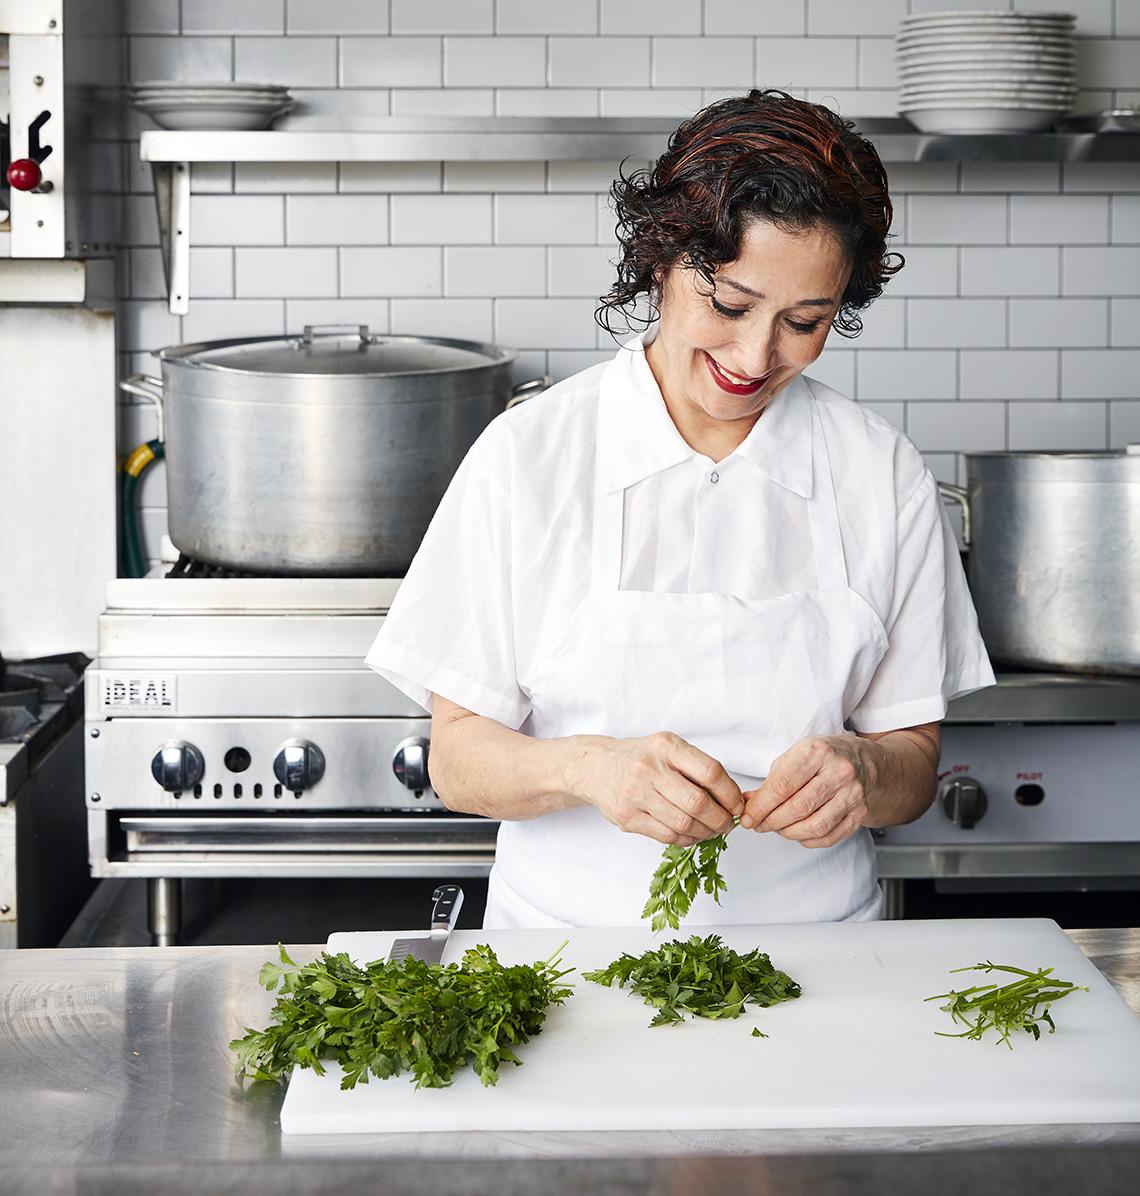 1140-nasim-alikhani-cooking-long.imgcache.rev21d54ecde2240783649e9b6572c0b80b.jpg